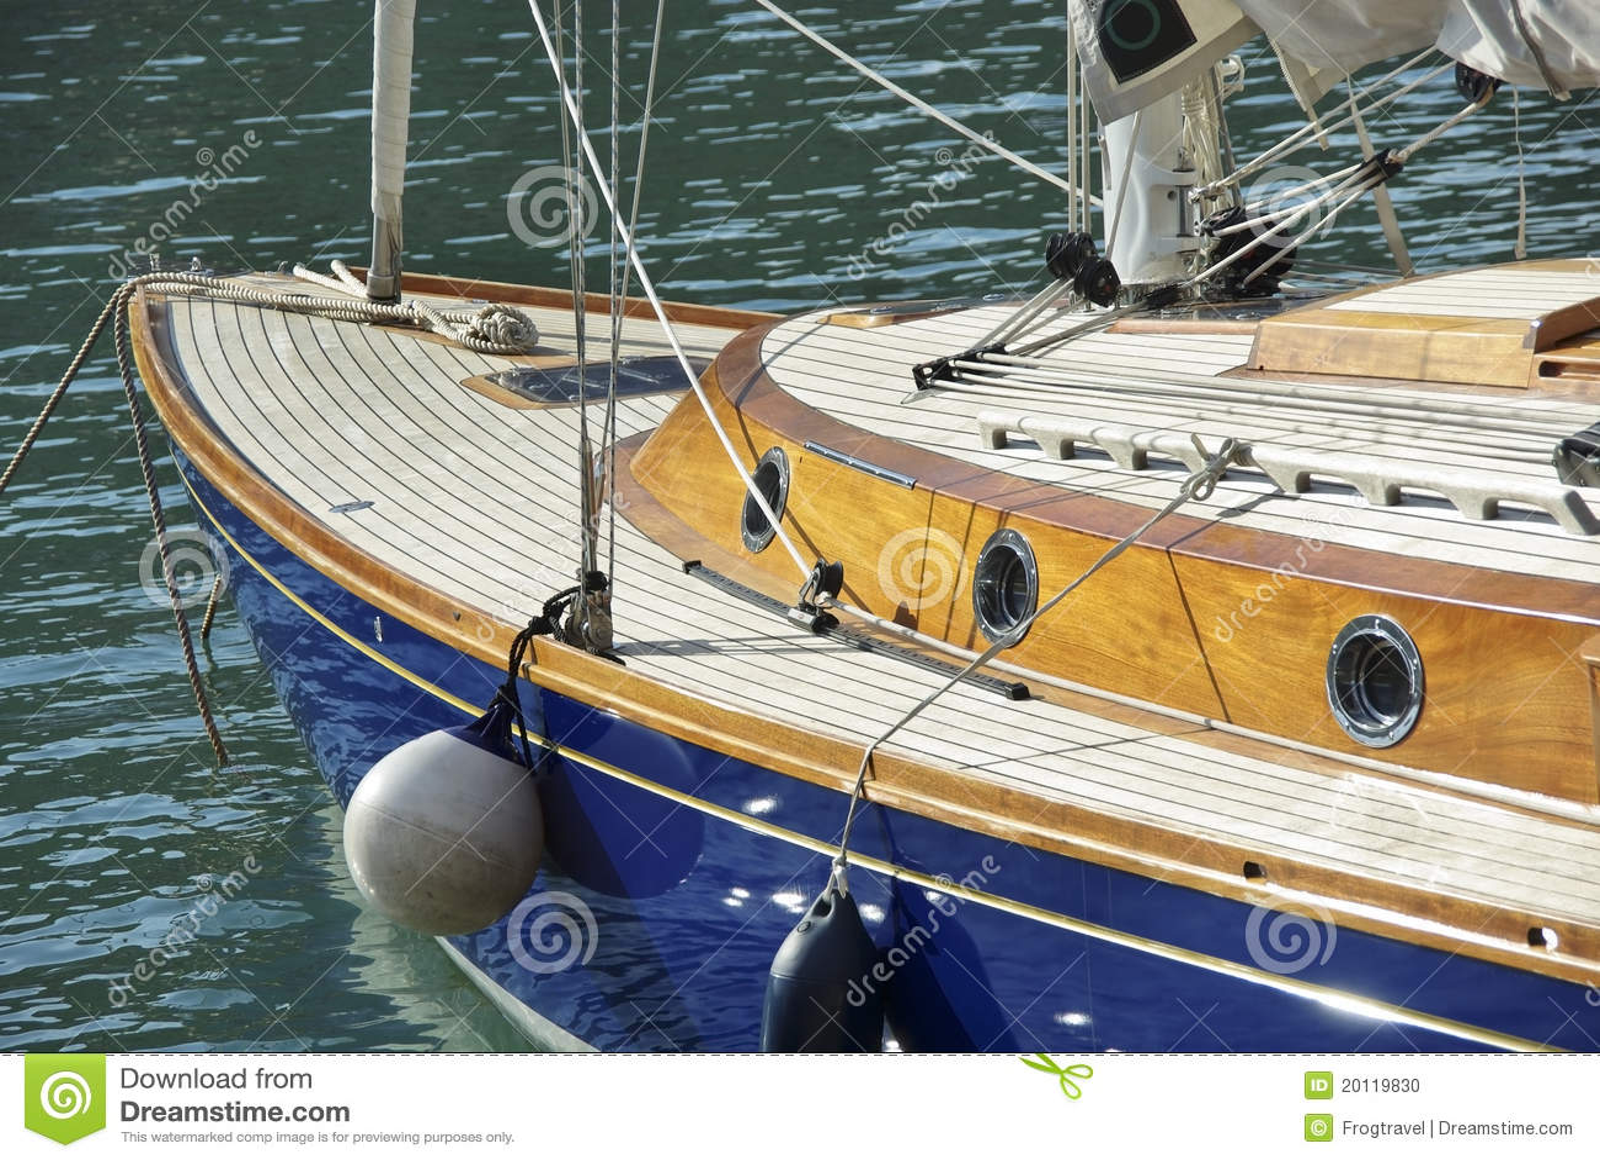 Wooden Yacht Stock Photo - Image: 20119830